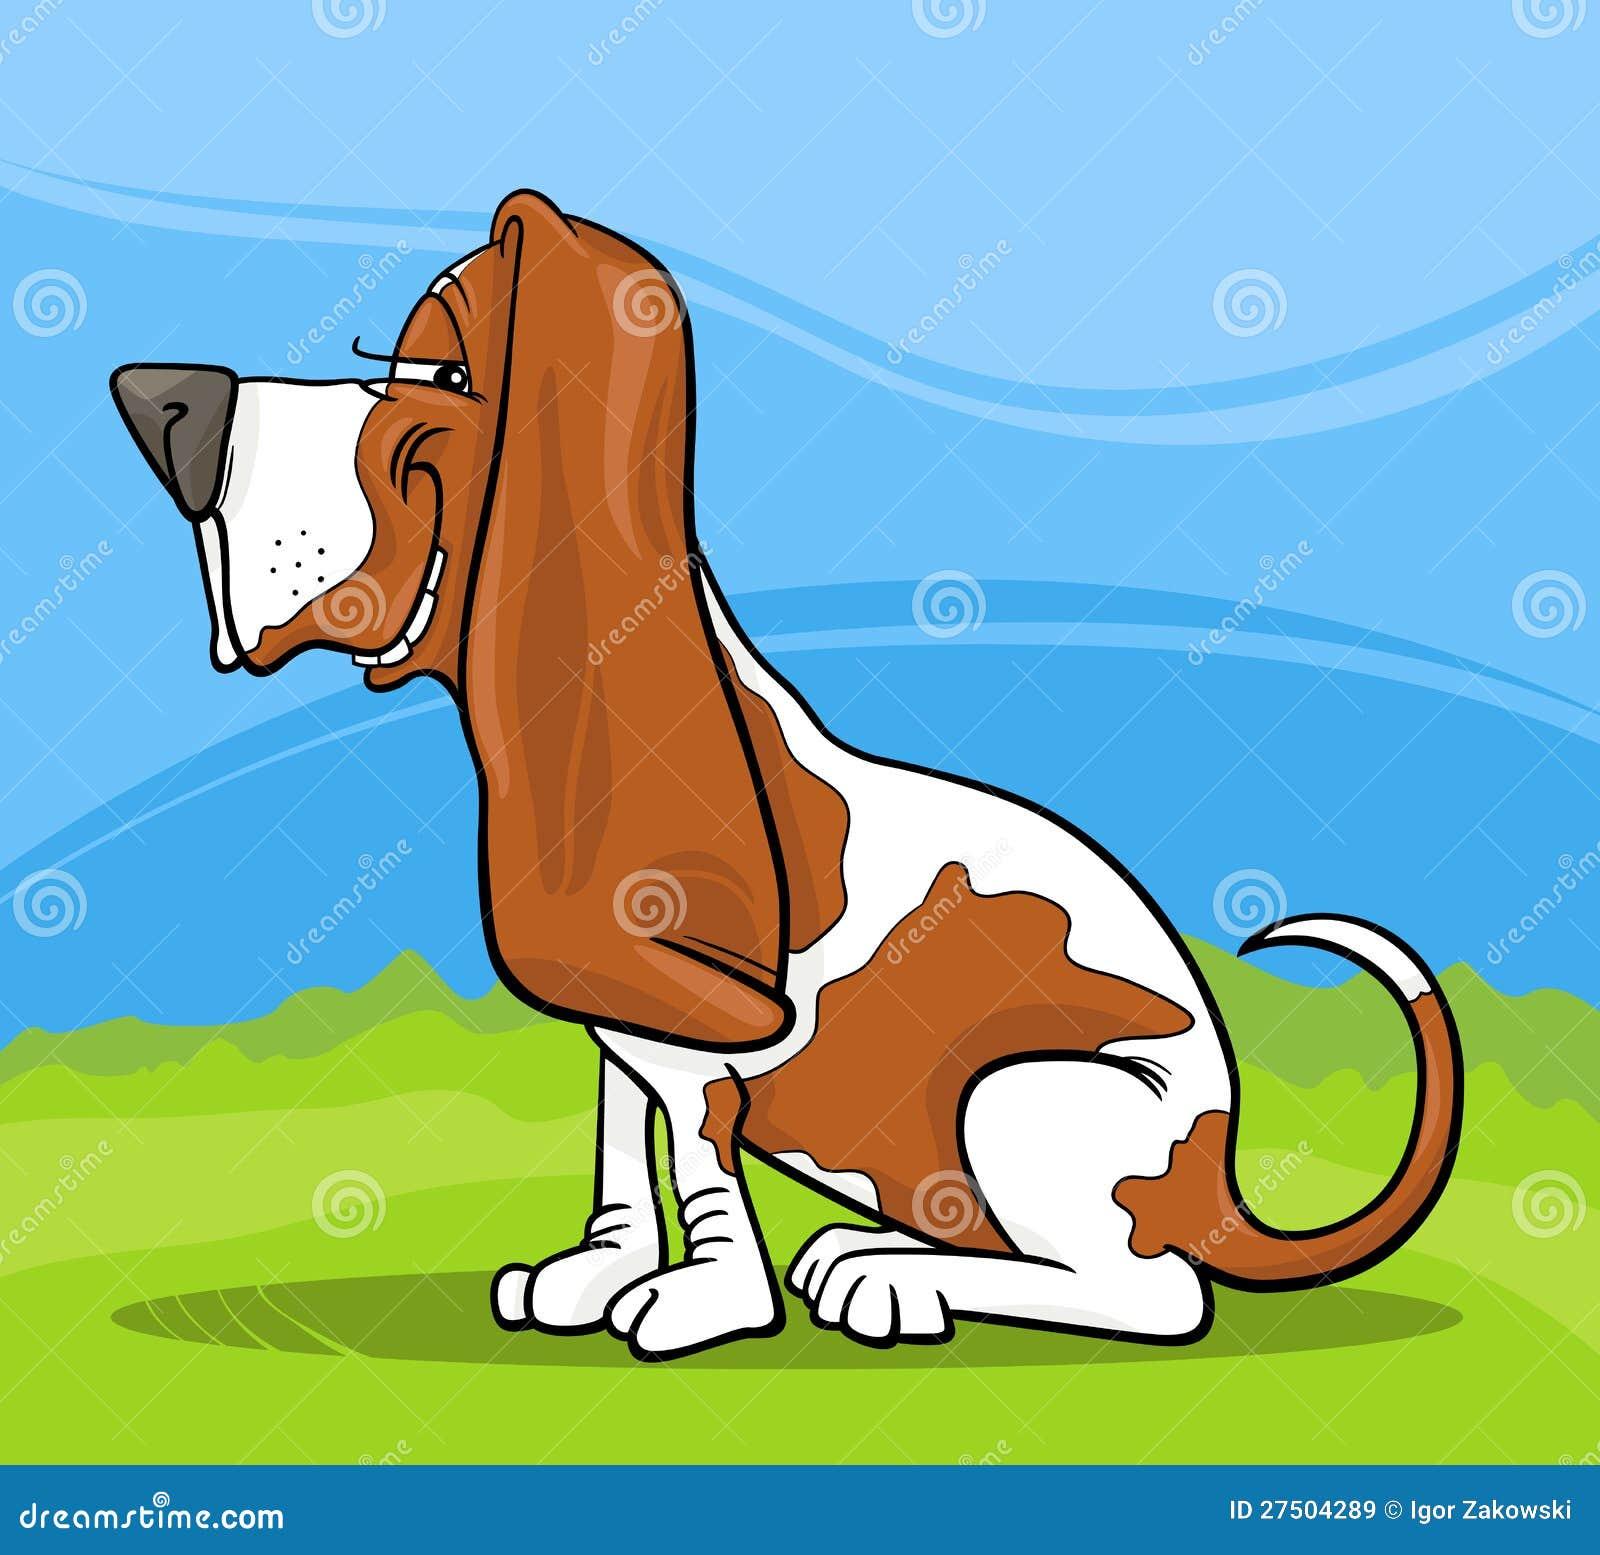 basset hound dog cartoon illustration stock vector image 27504289 Animated Puppy Clip Art Dog Graphic